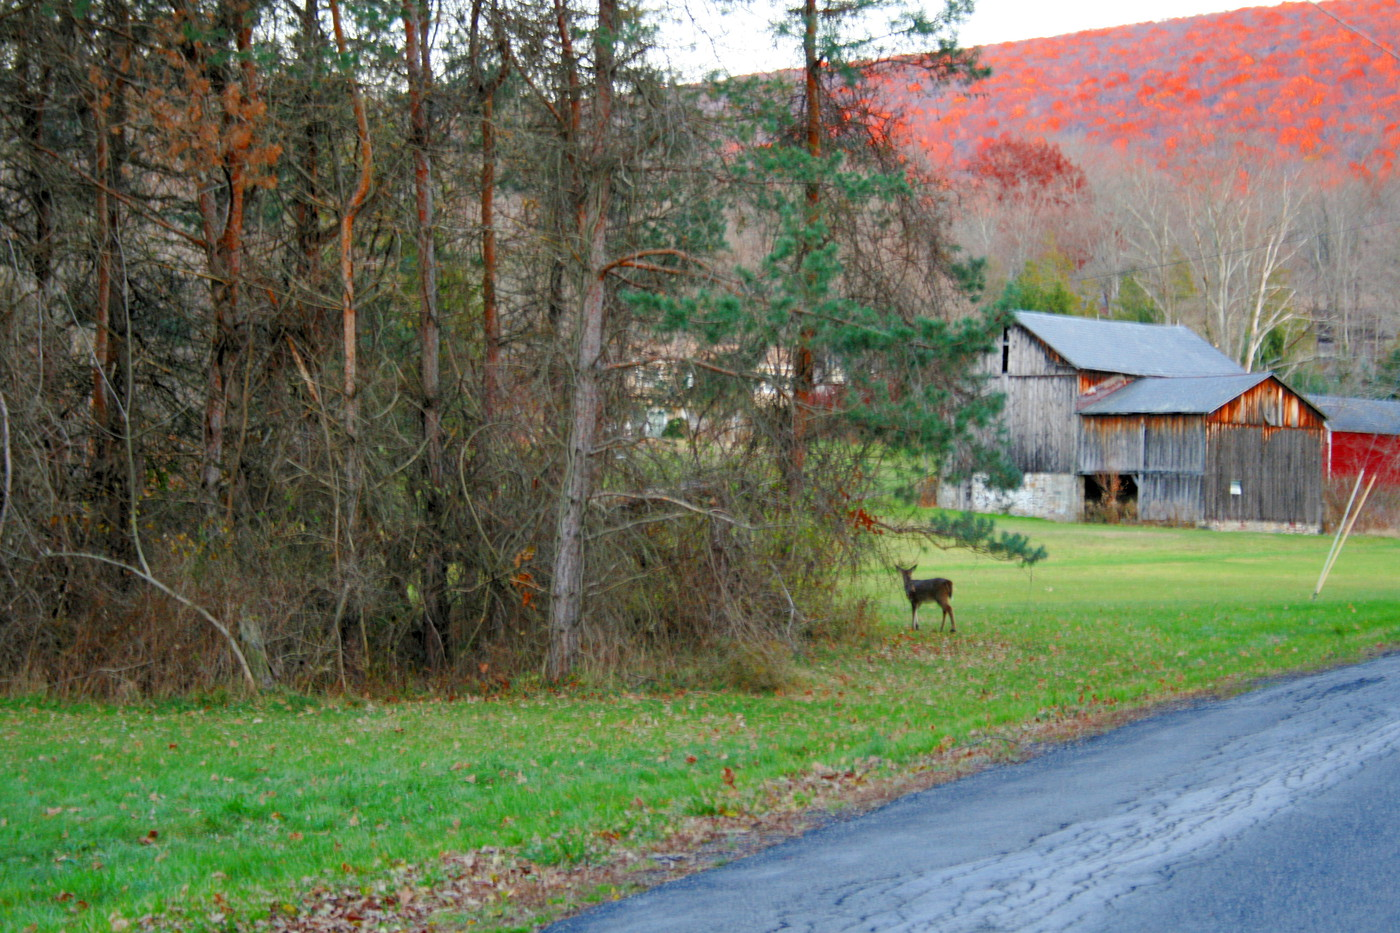 Deer, Woods and a Pennsylvania Barn